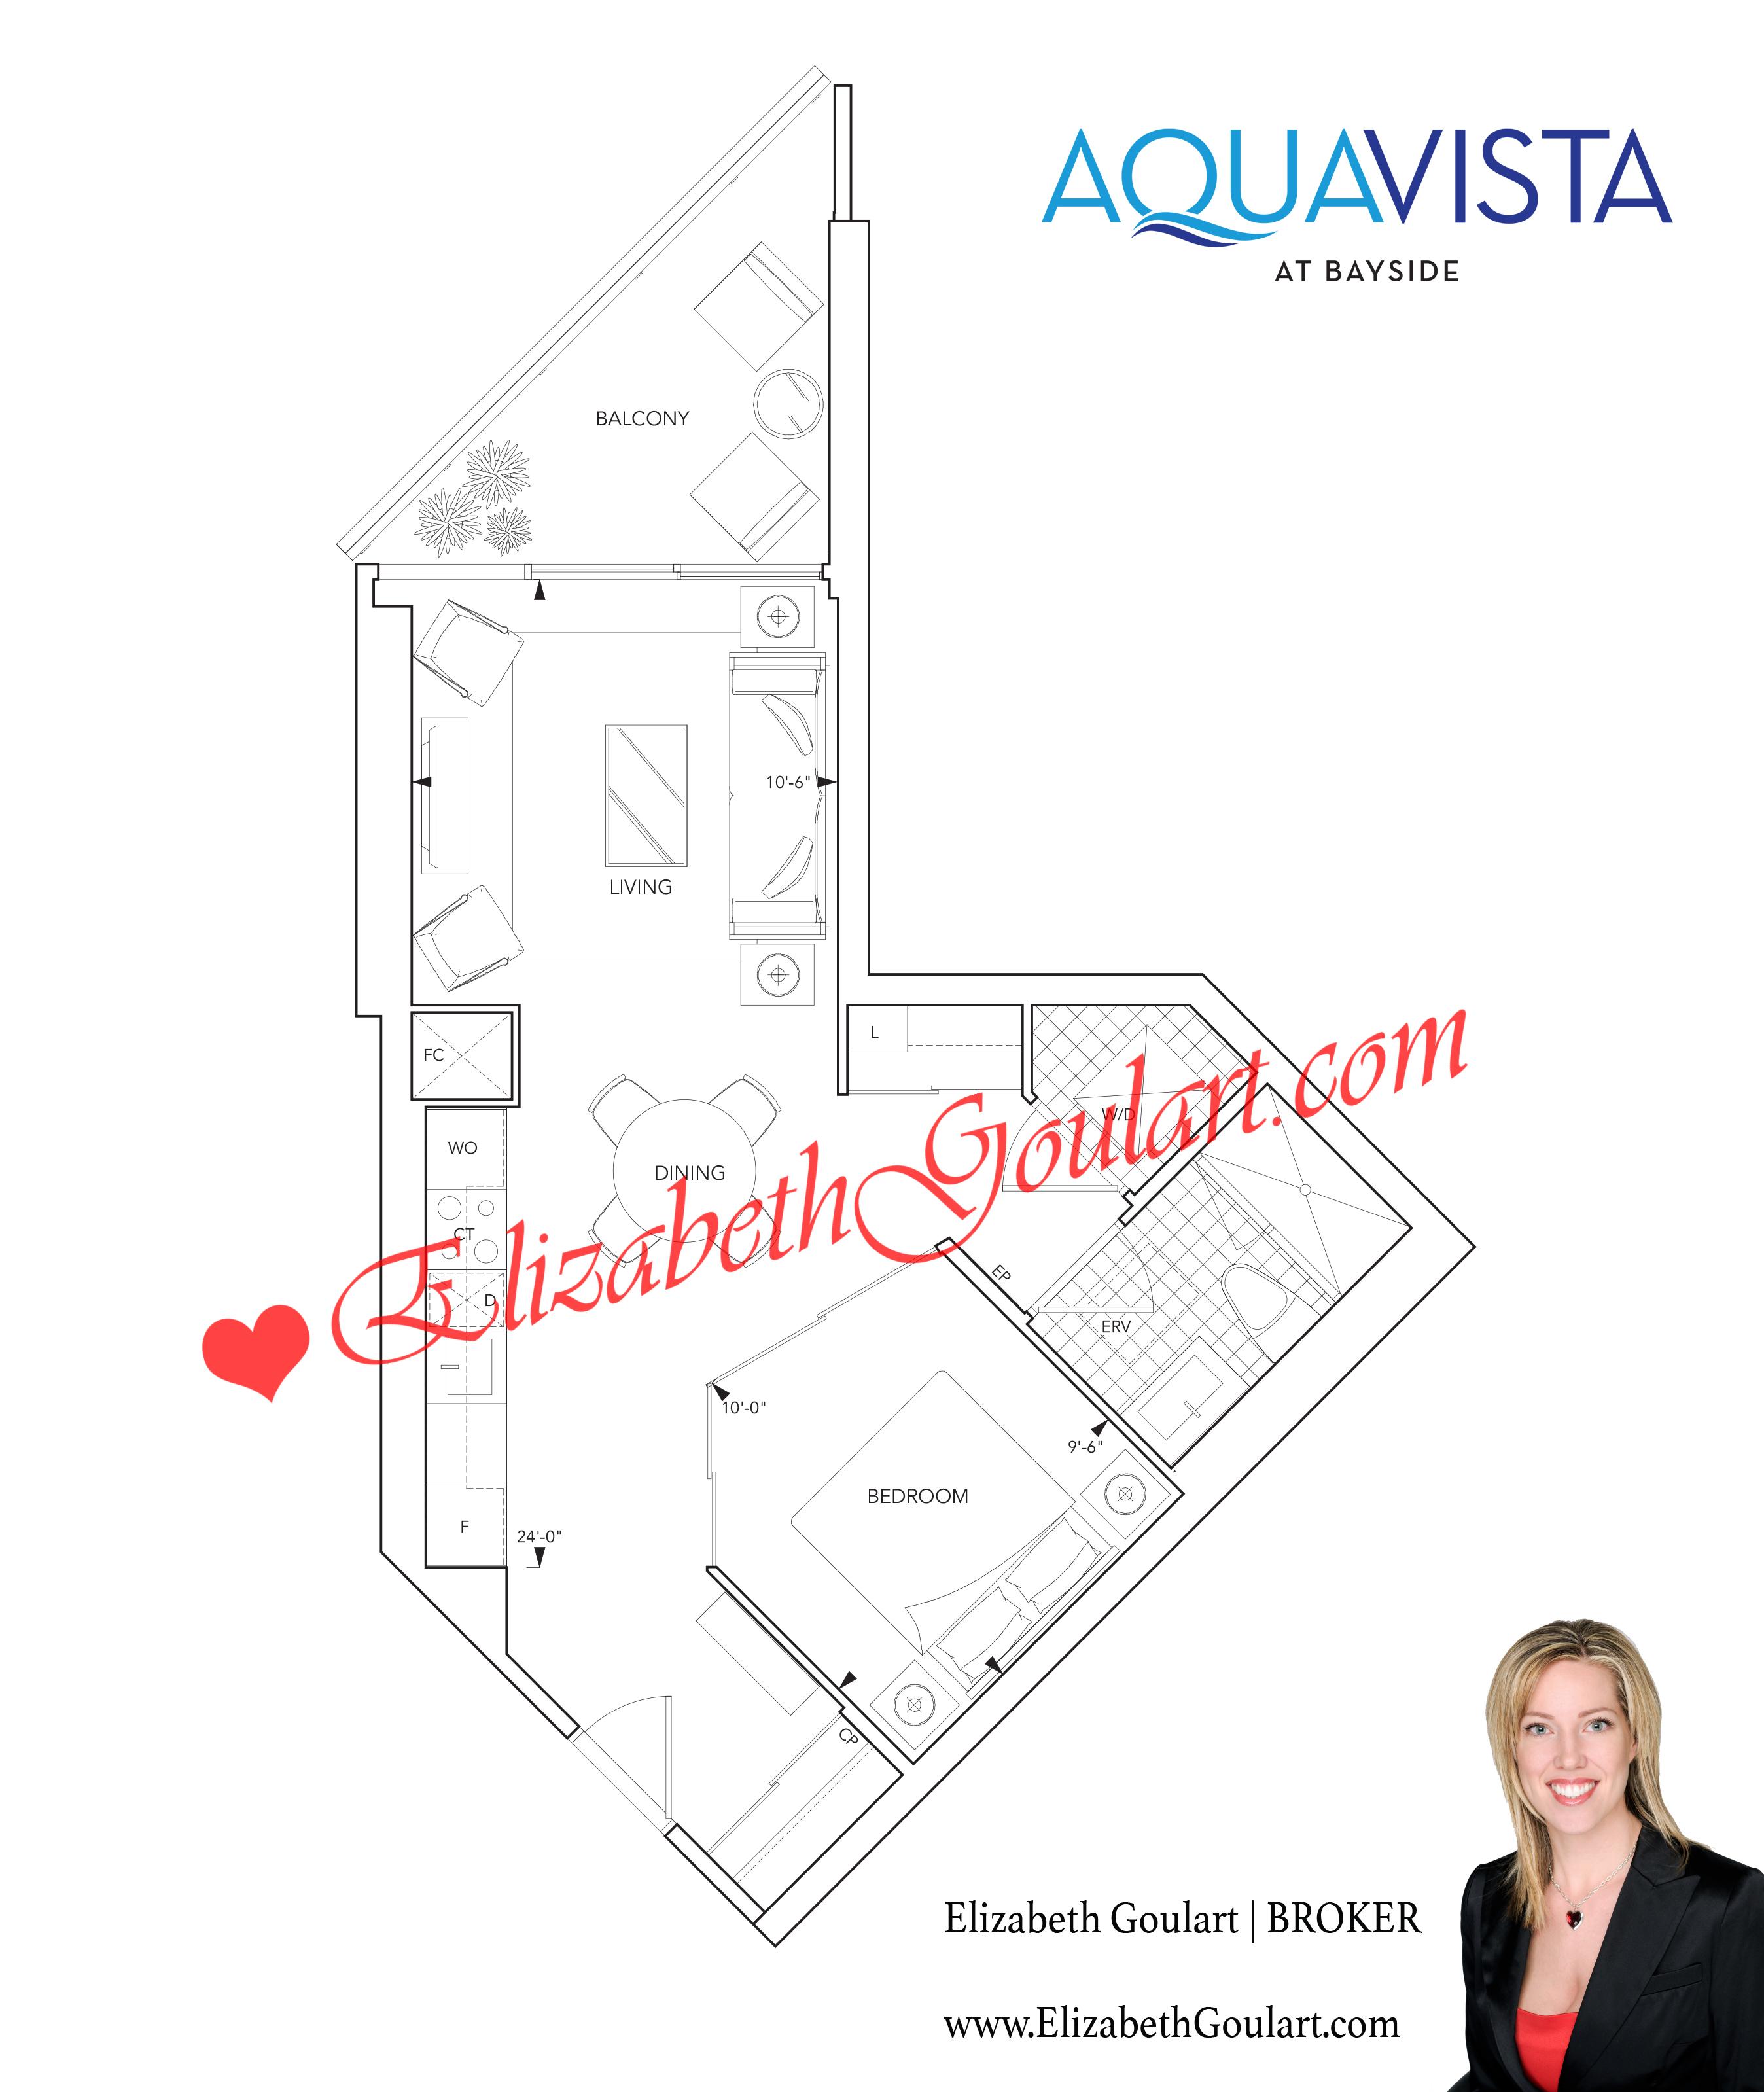 1 Edgewater Drive Aquavista At Bayside For Sale Rent Elizabeth Goulart Broker